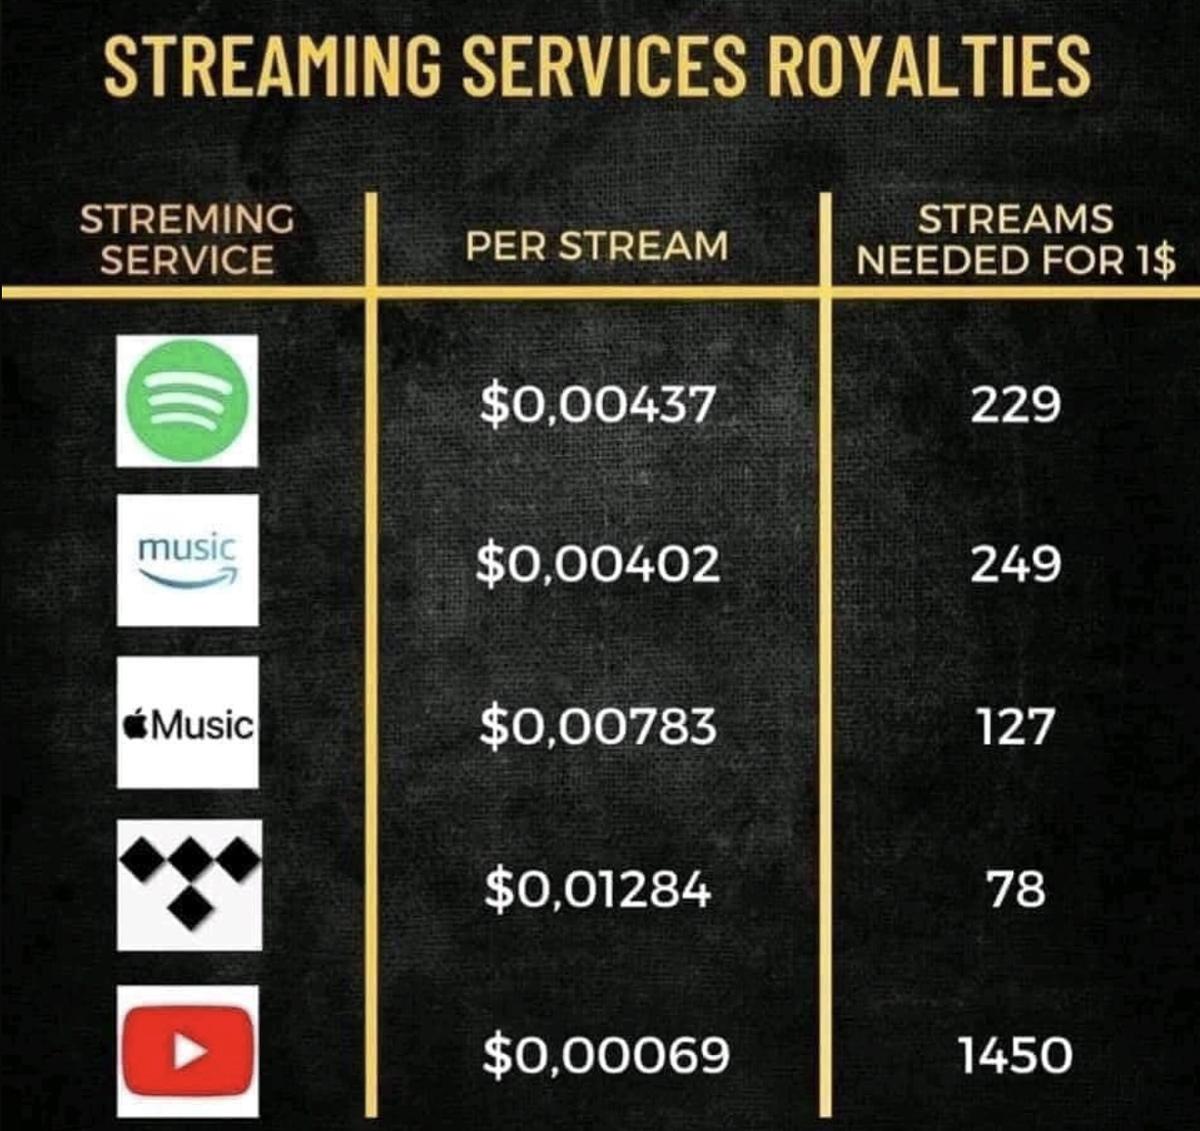 Streaming Service Royalties